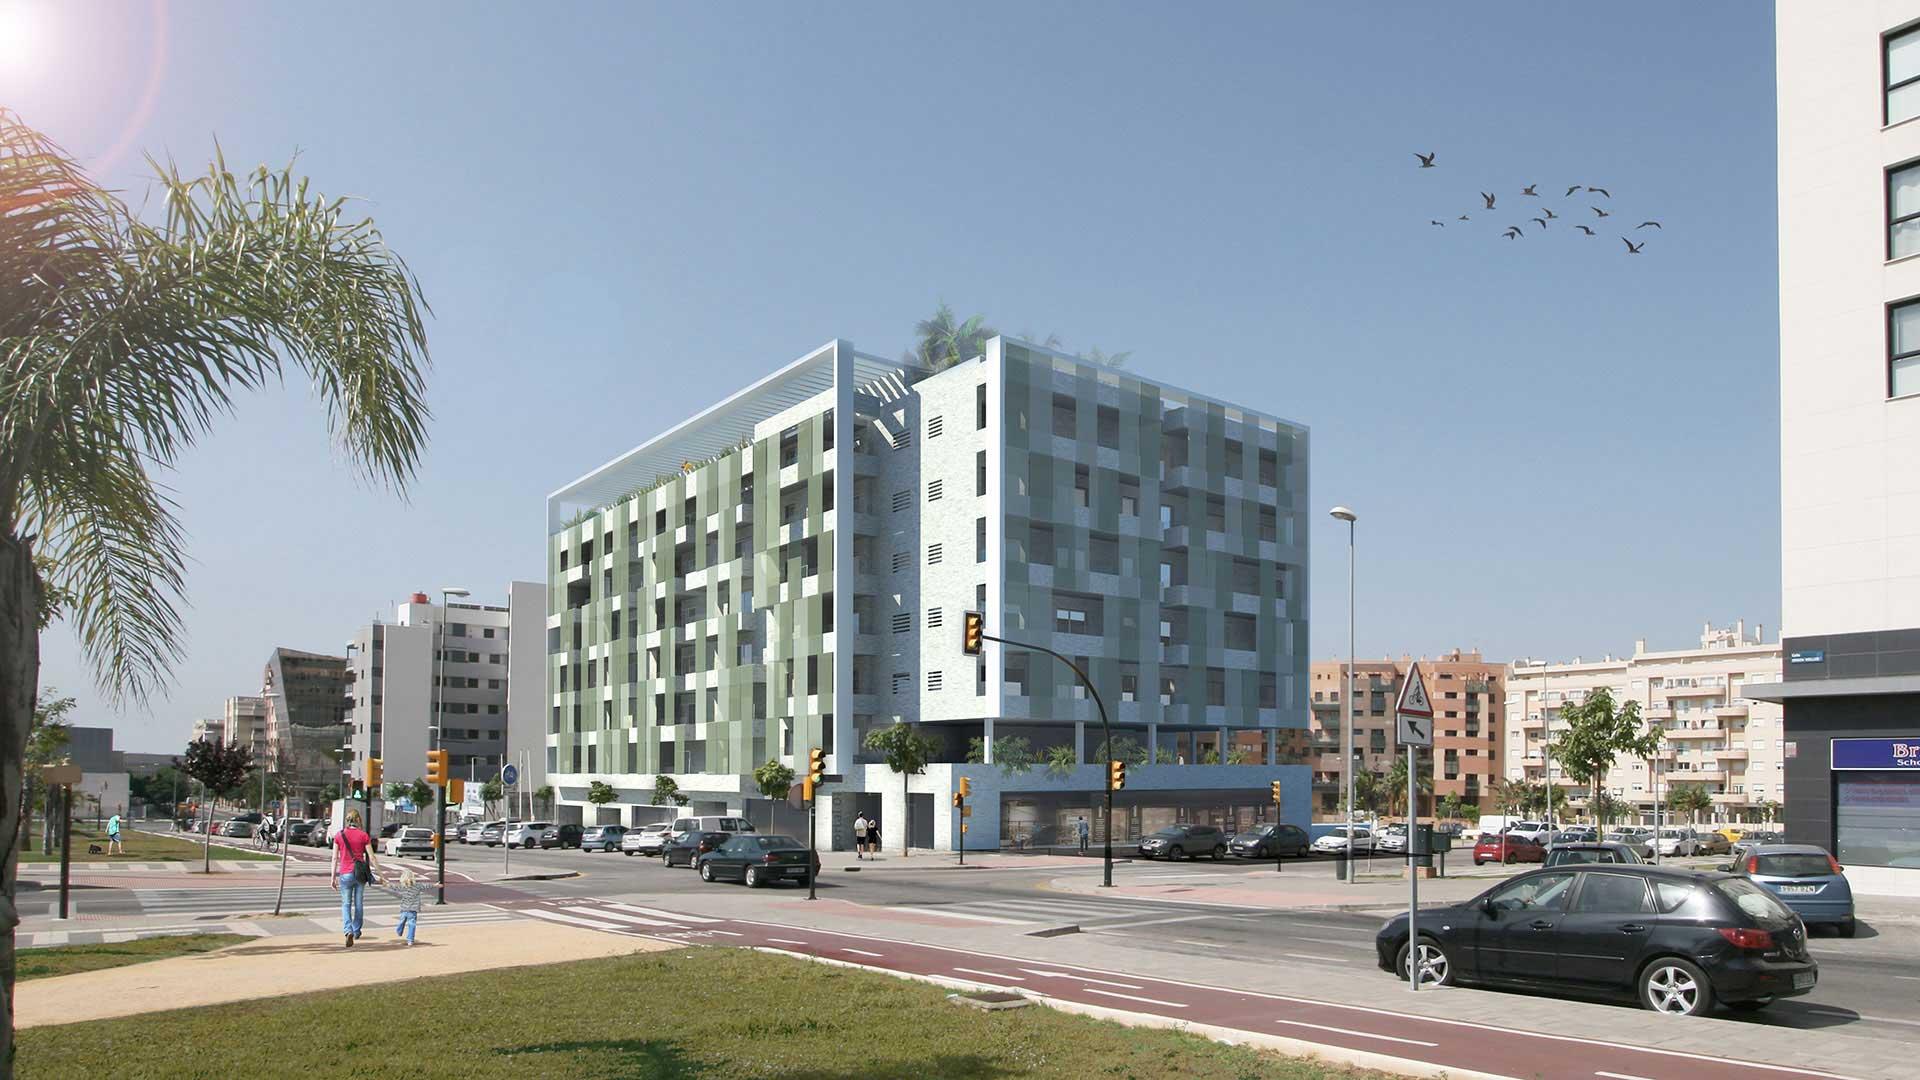 Concurso edificio de viviendas en teatinos lvaro cappa for Hotel diseno malaga